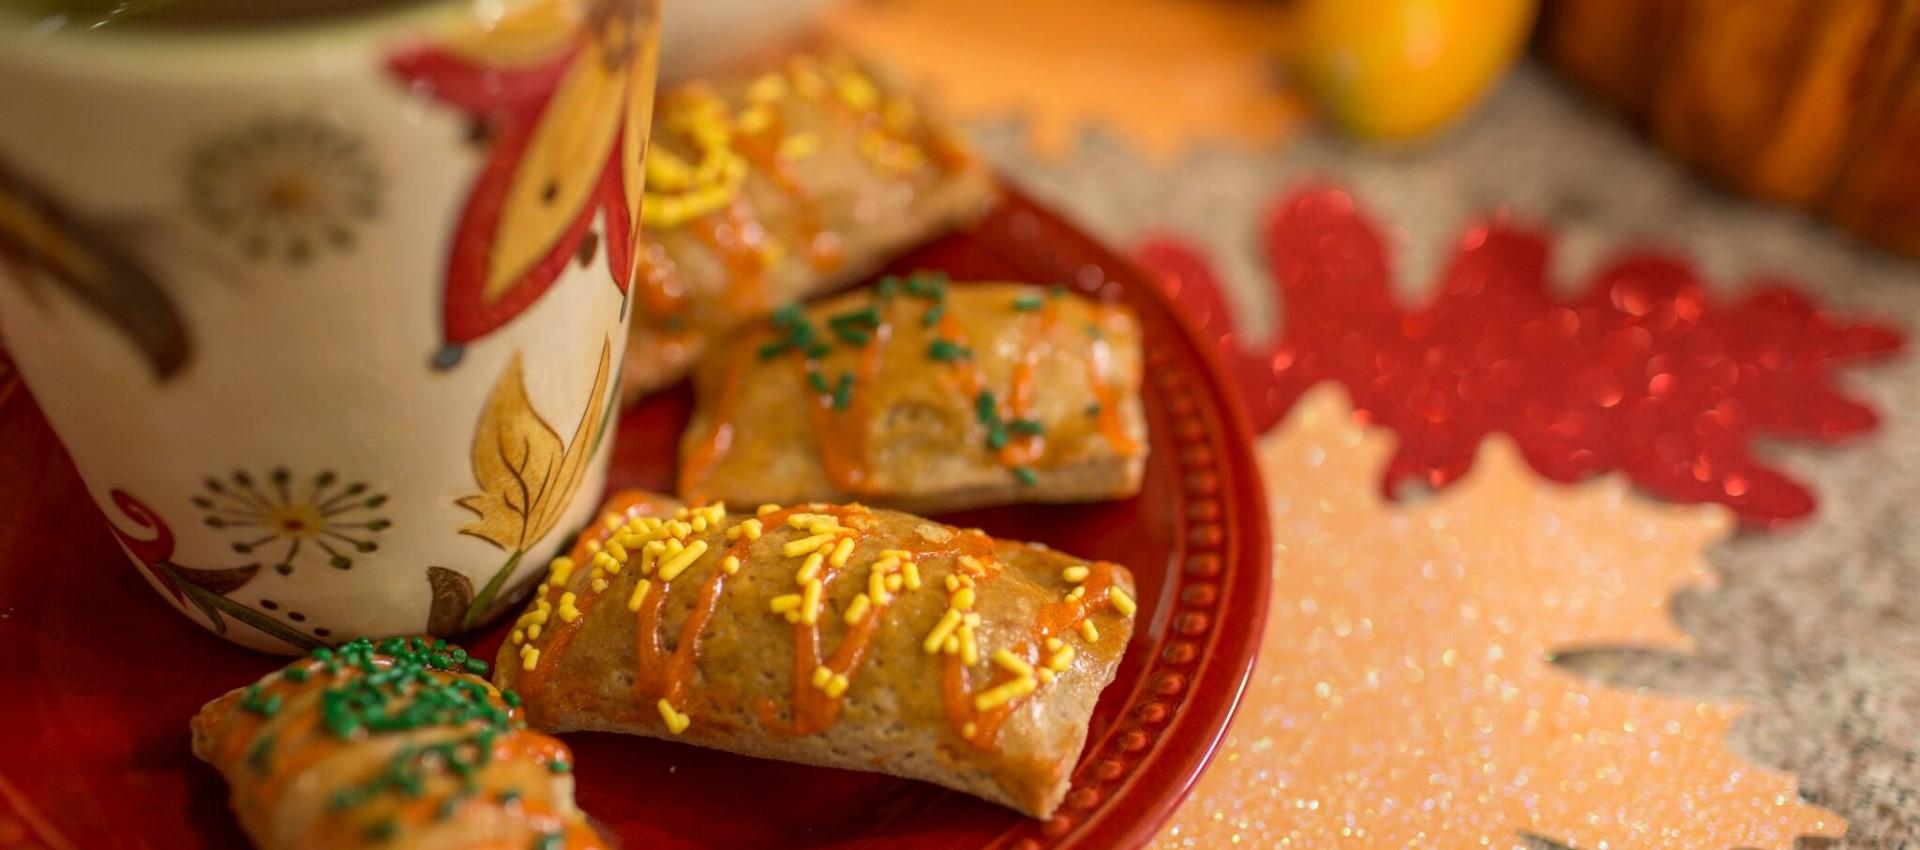 Pumpkin Empanadas Image